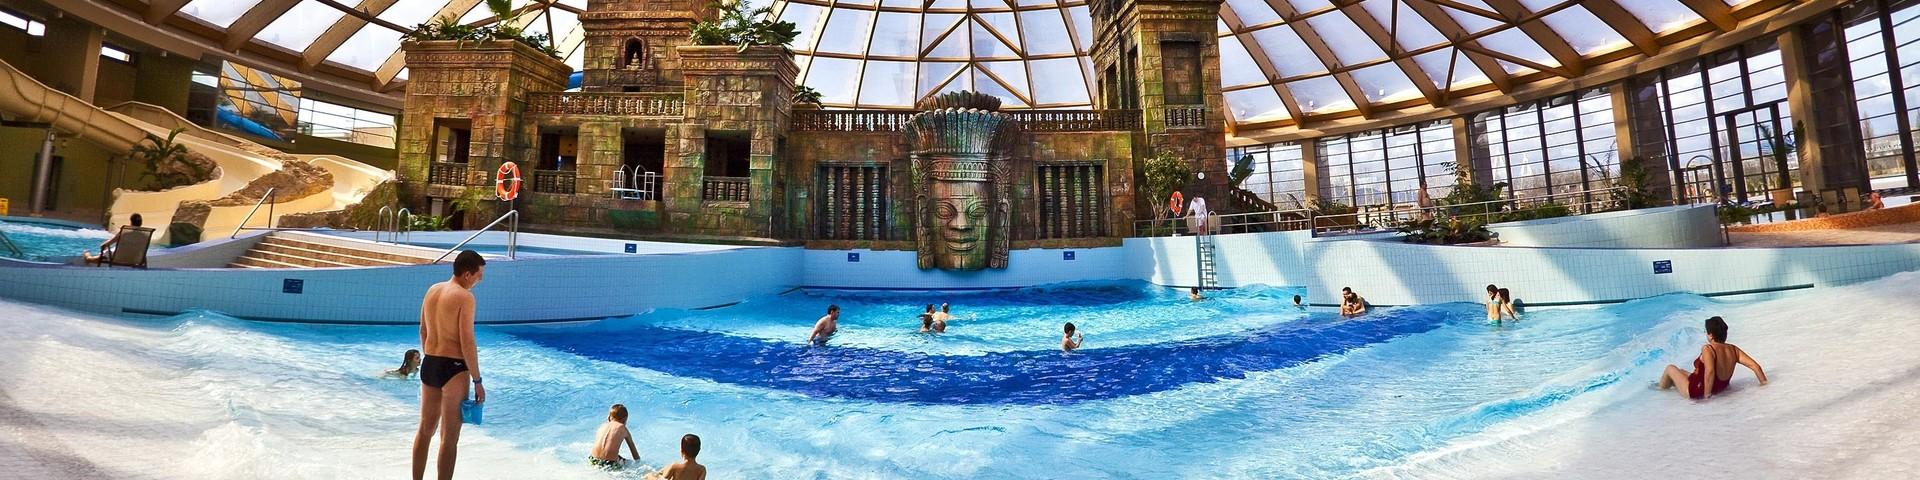 Aquaworld Resort Budapest - Aquaworld © Aquaworld Resort Budapest